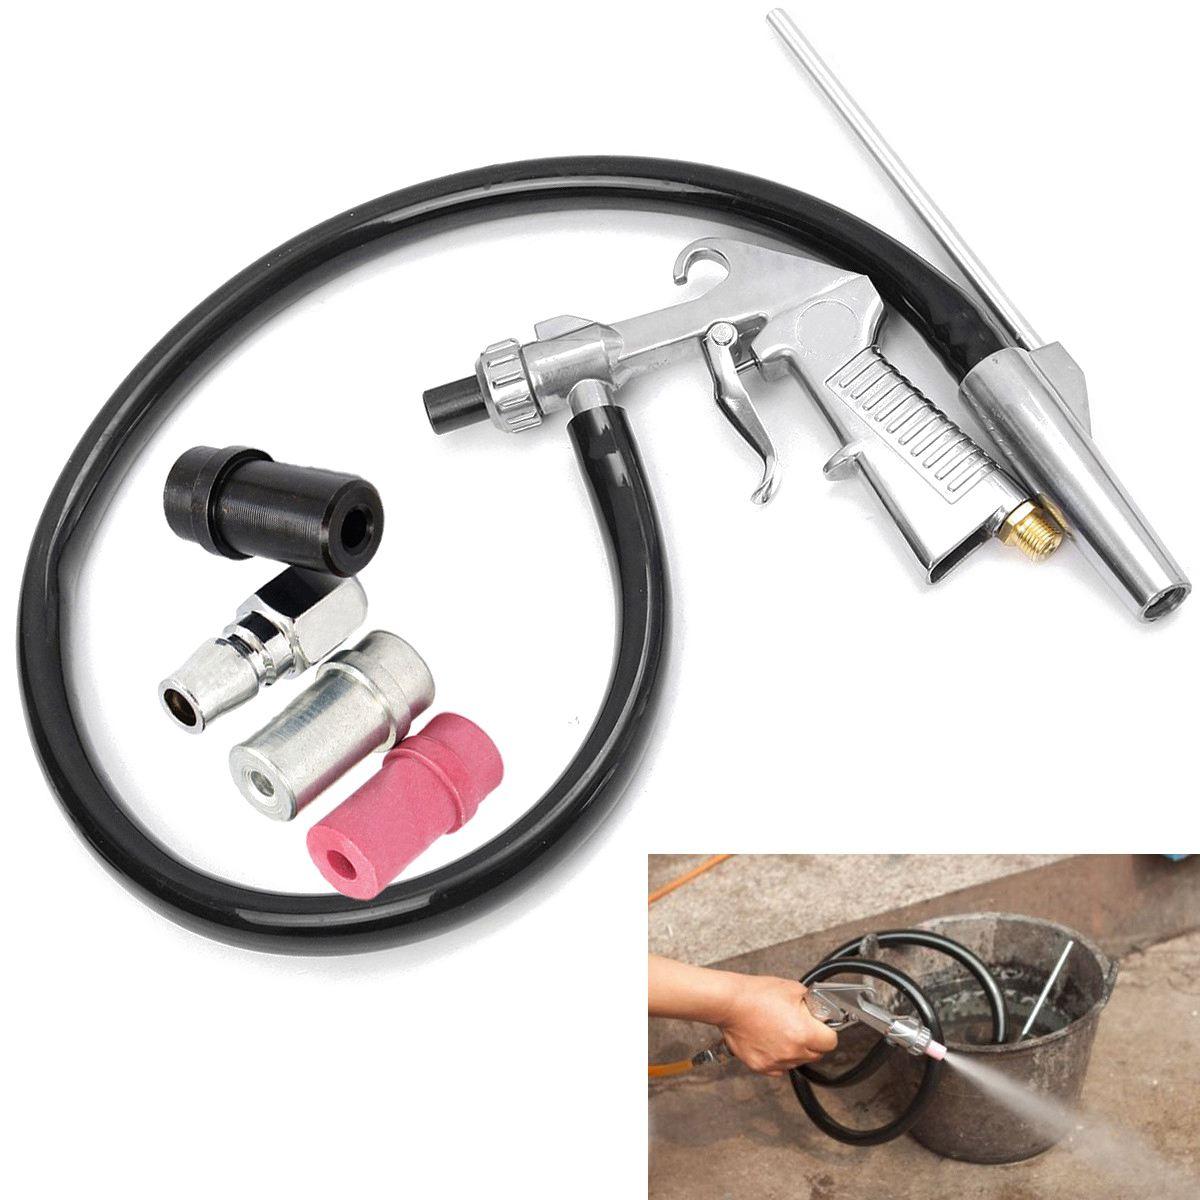 High Quality Air Sand Blasting Gun Kit  Sandblaster Kit Sandblasting Blast Gun+3 Nozzles+Connector+Tube Derusting Tool Kit